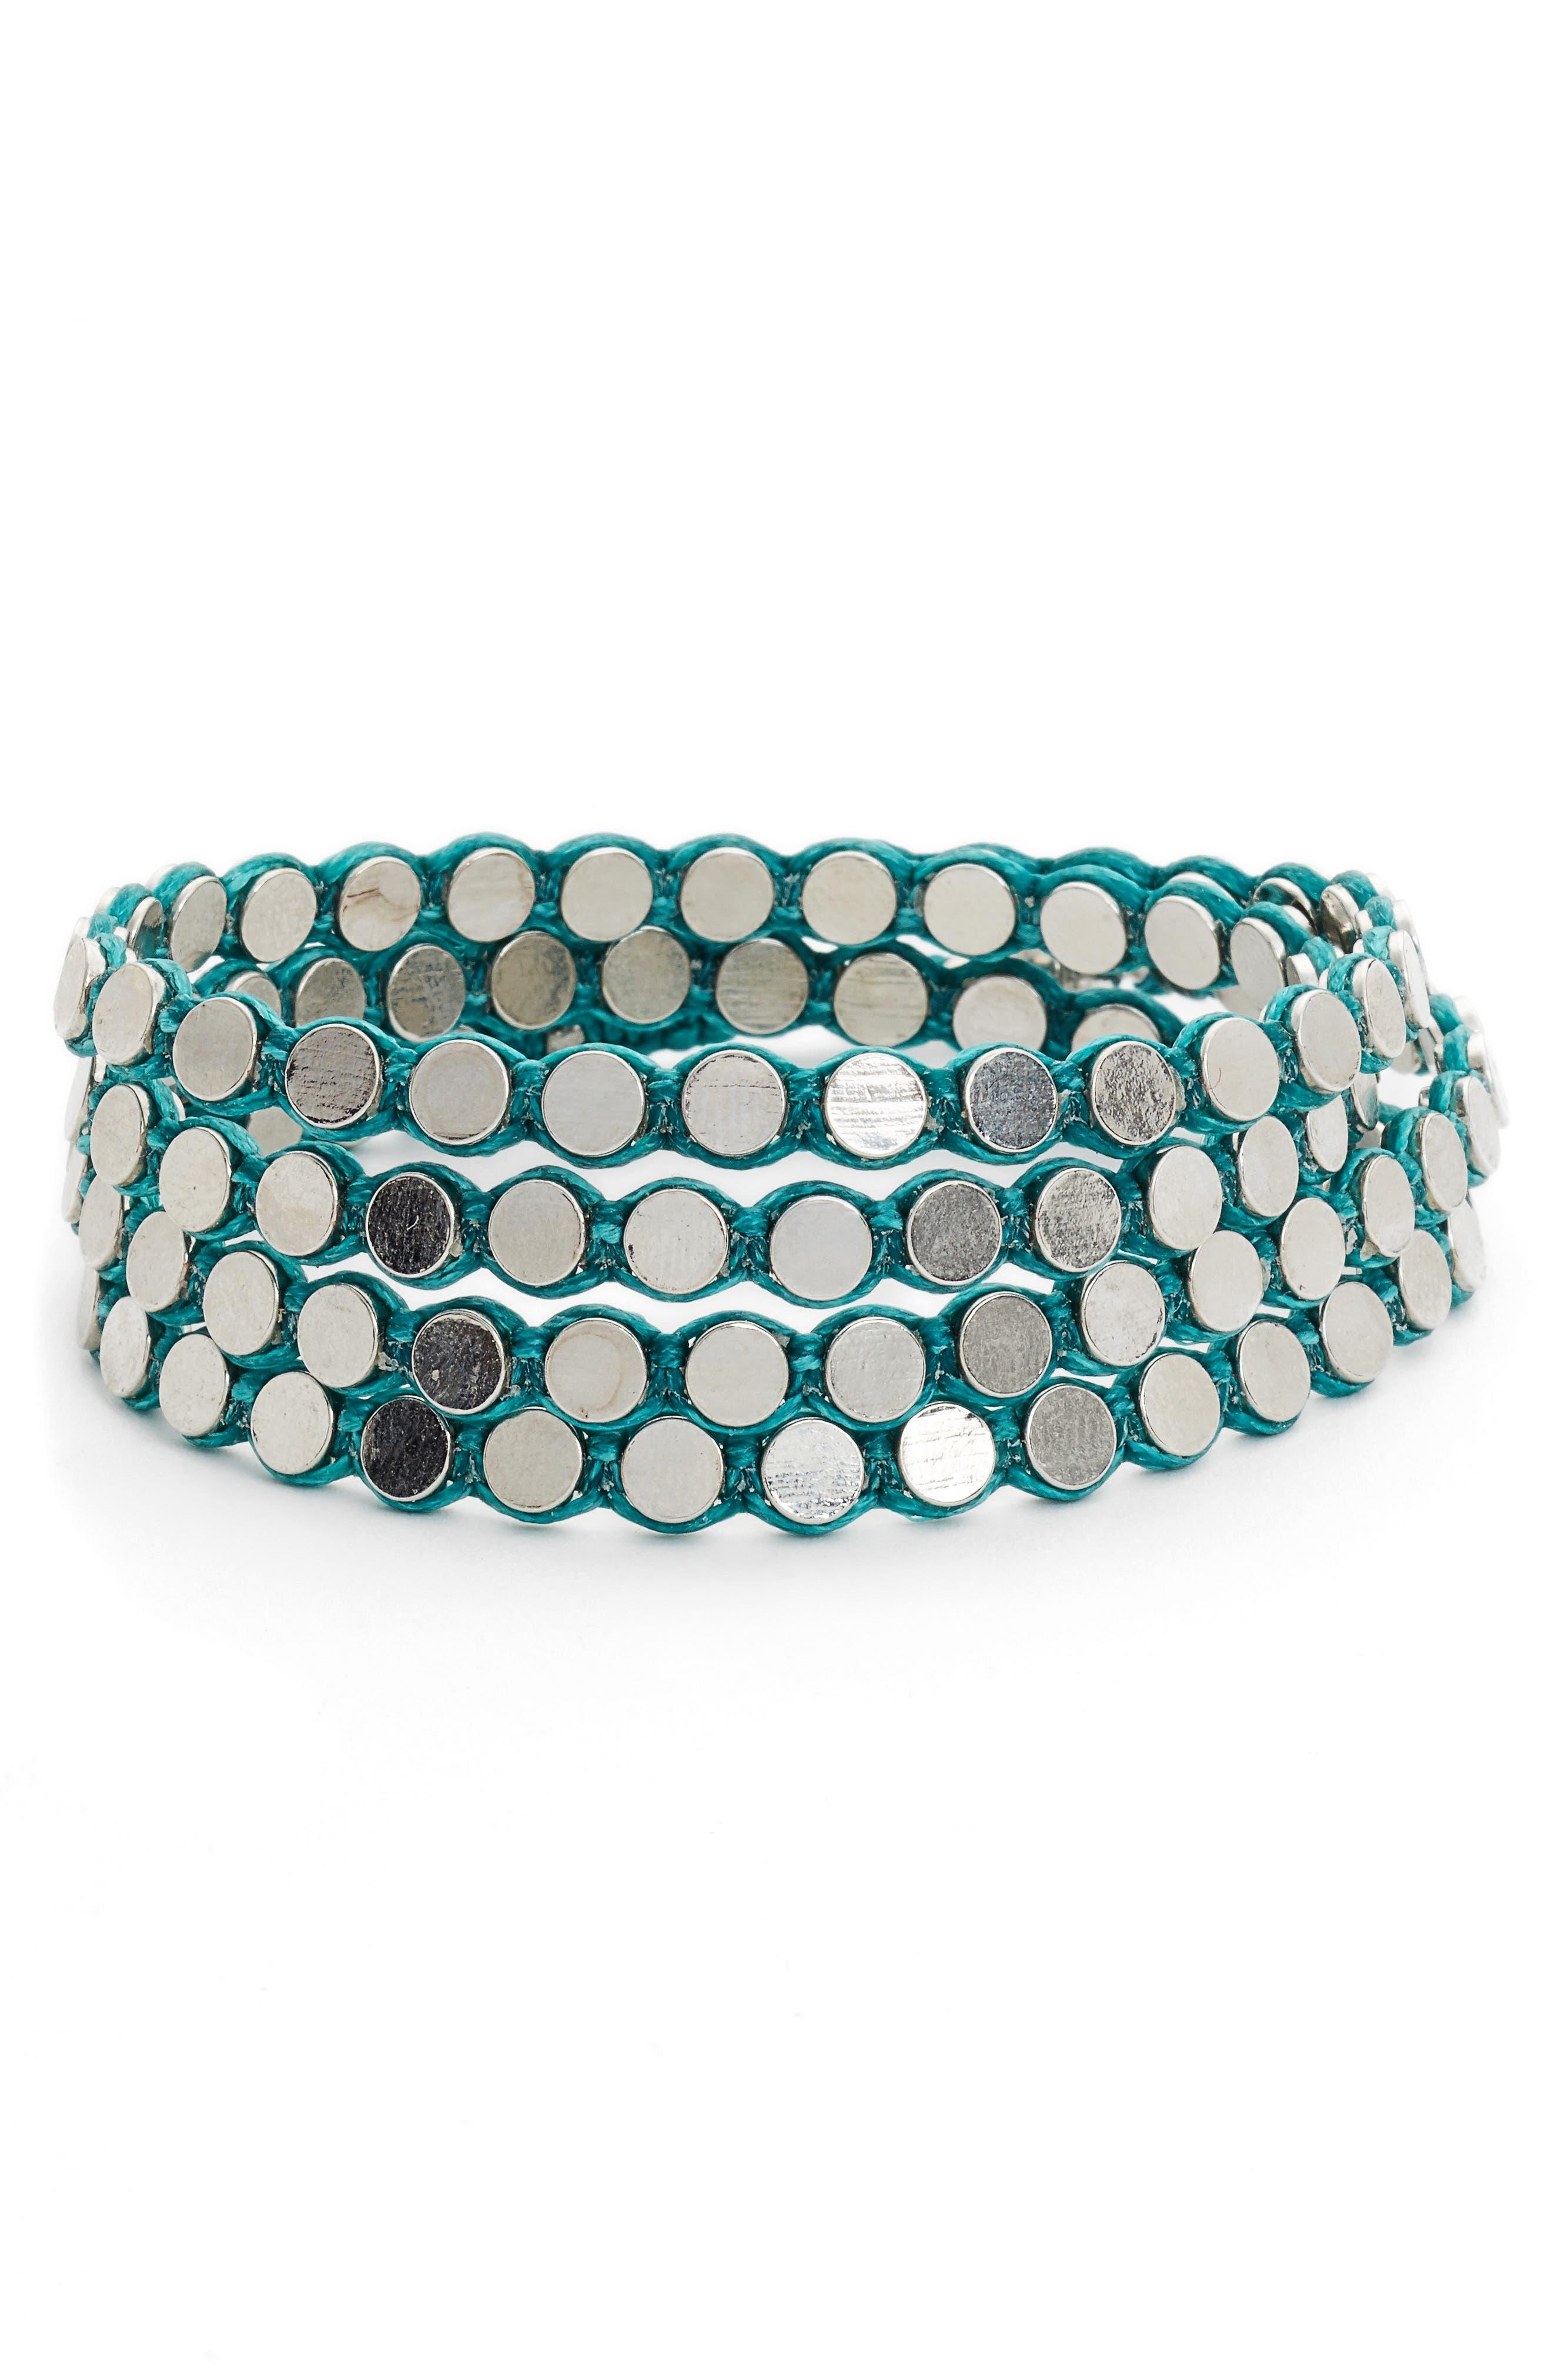 Disk Wrap Bracelet,                         Main,                         color, Silver/ Turquoise